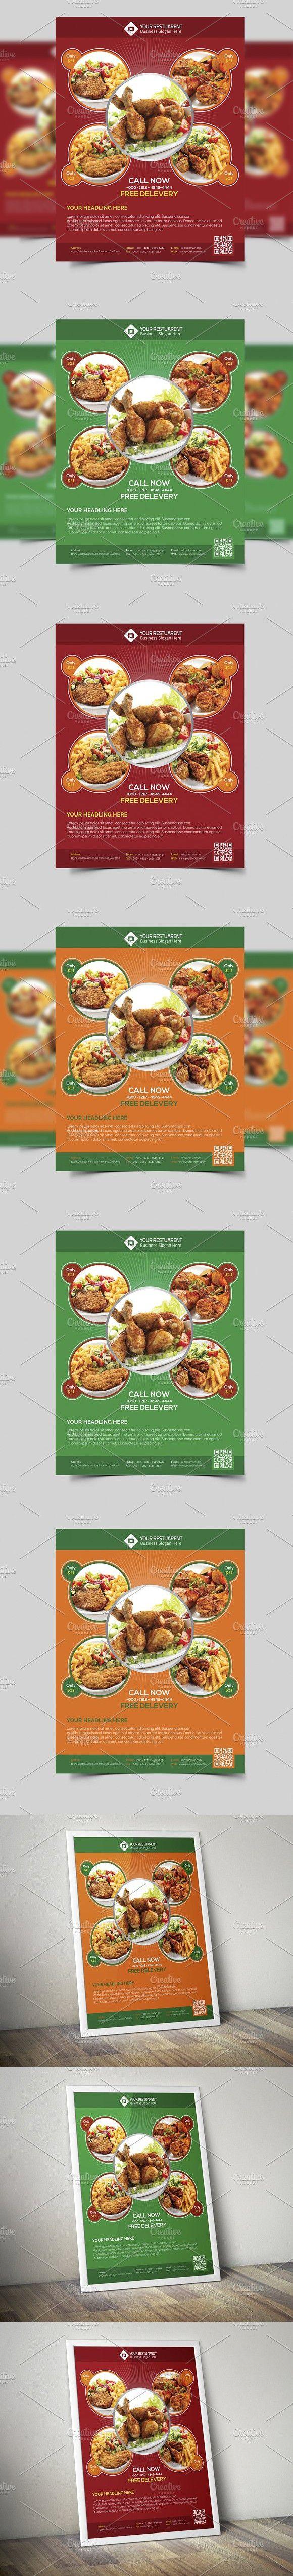 Restaurant u0026 Food Flyer Template 61 best